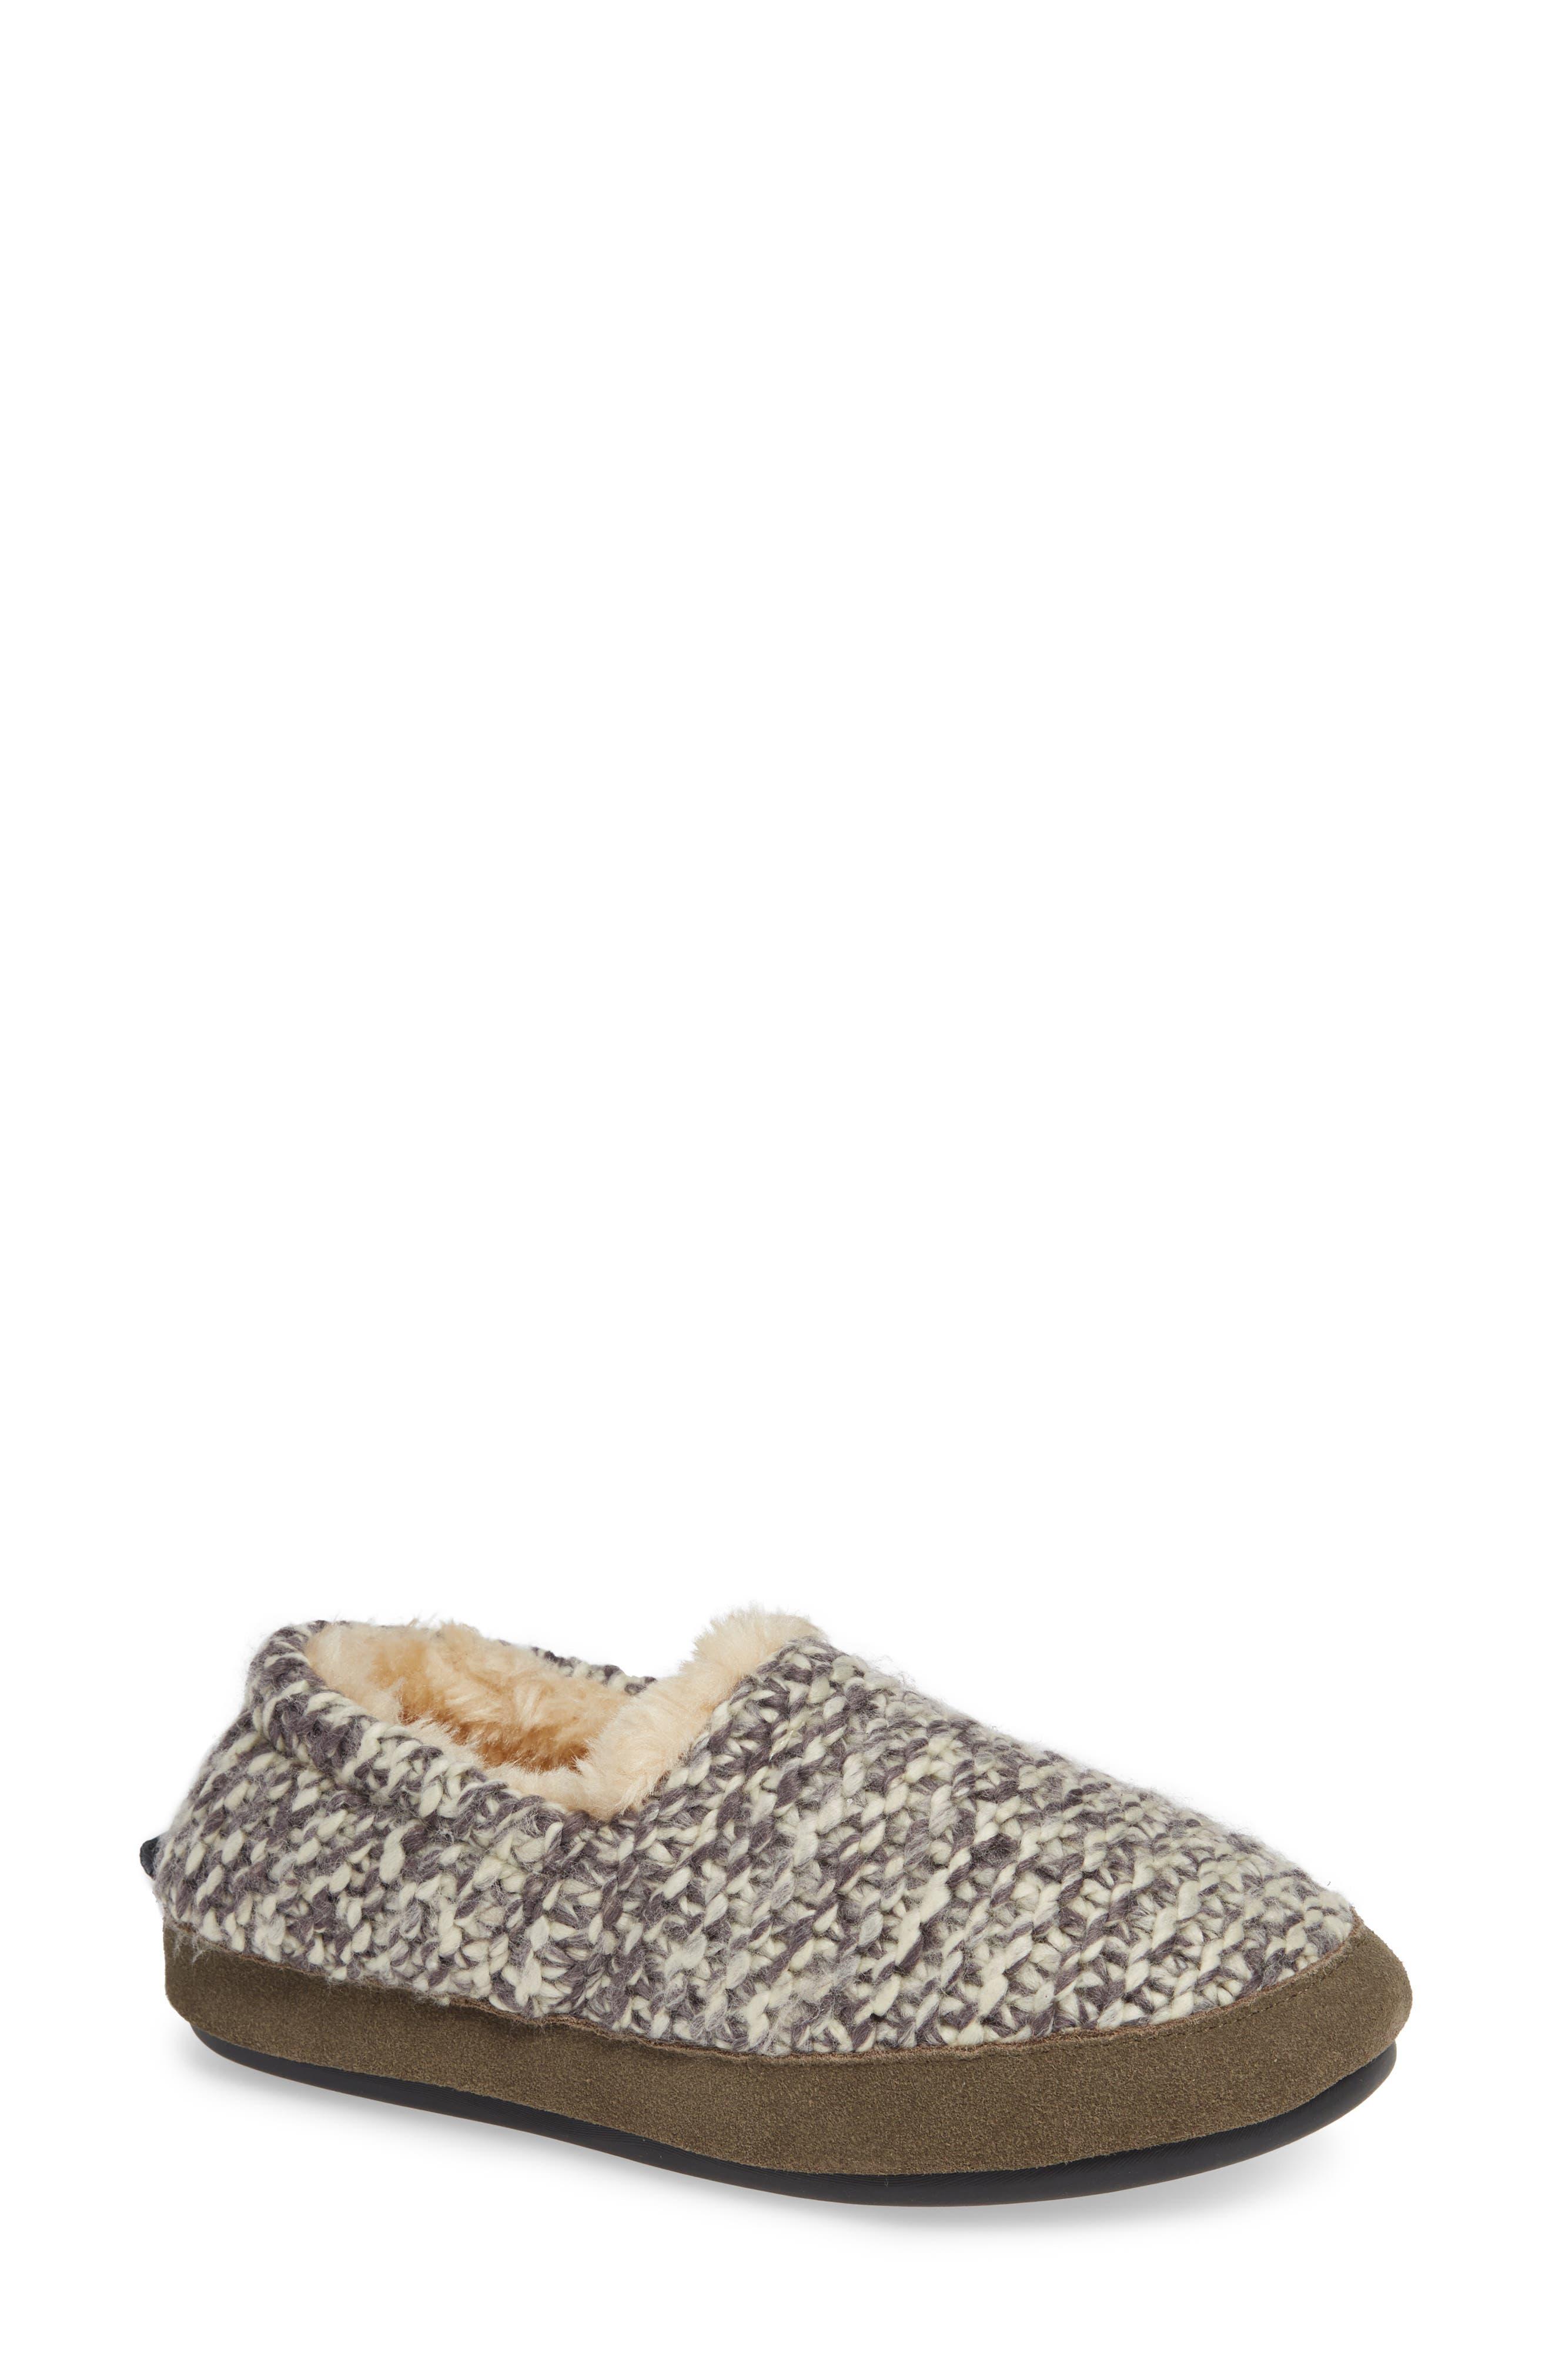 Whitecap Knit Slipper,                             Main thumbnail 1, color,                             WARM NEUTRAL FABRIC